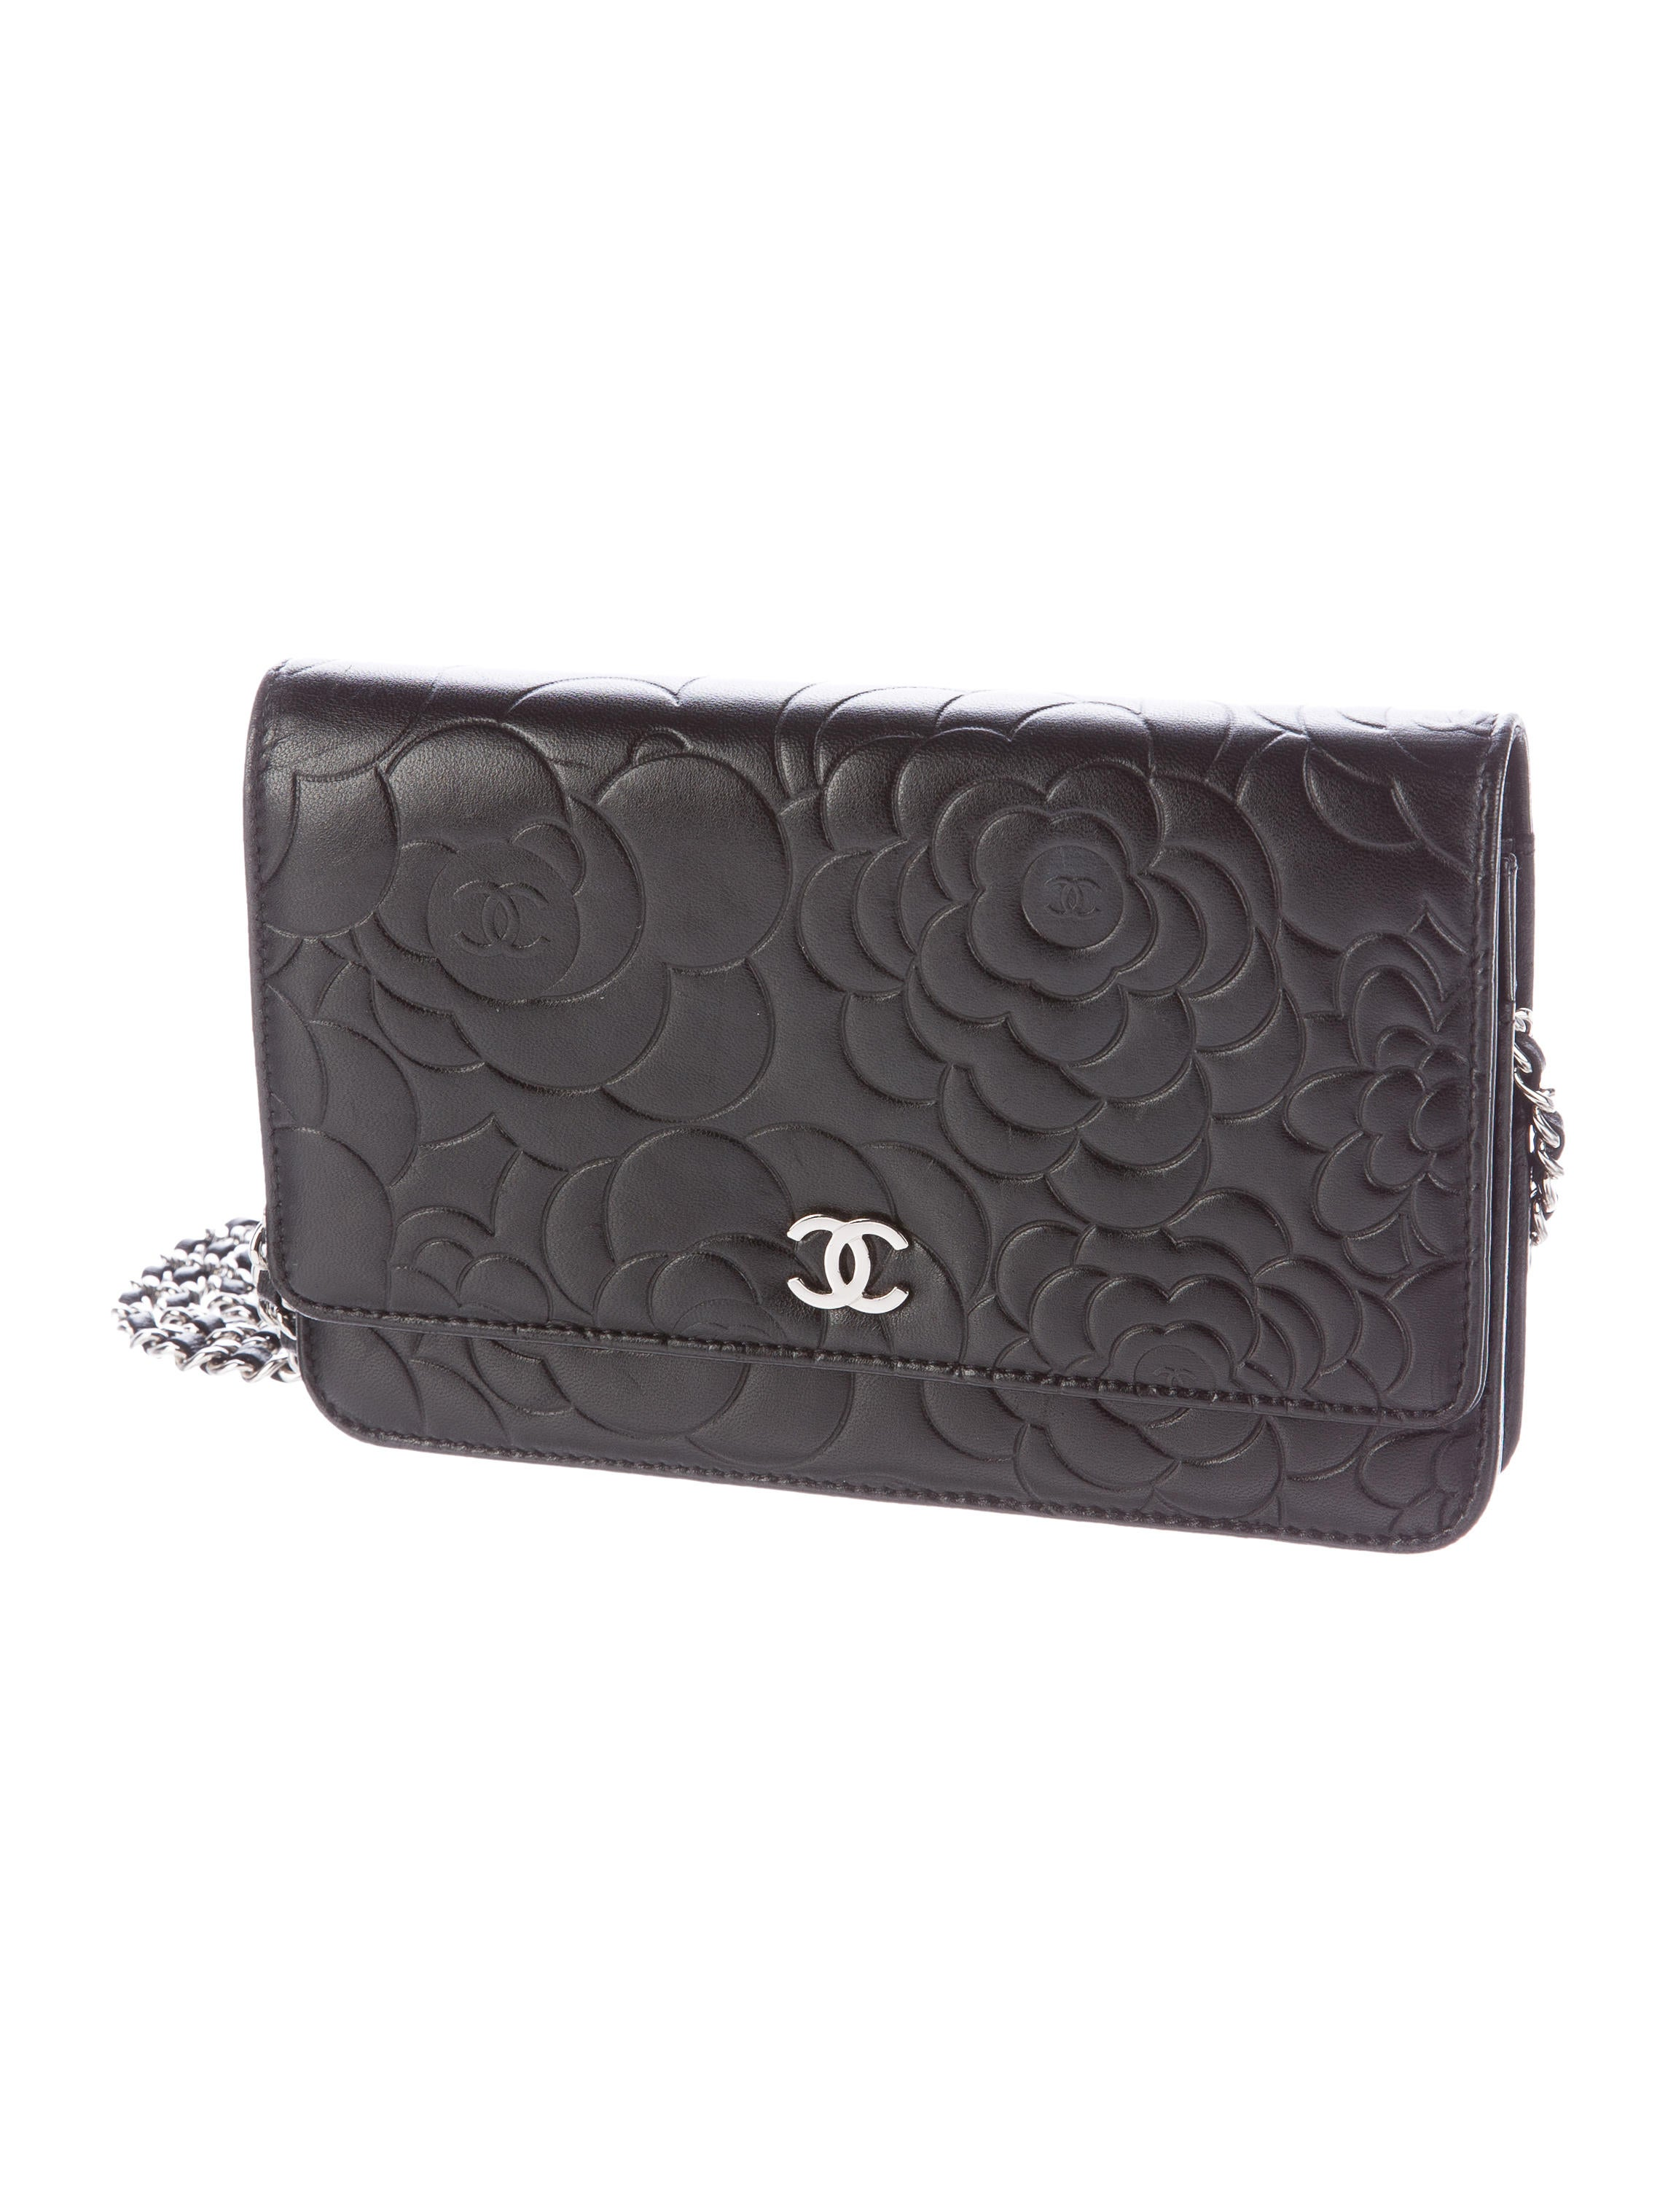 Chanel Camellia Wallet On Chain - Handbags - CHA187133 ...